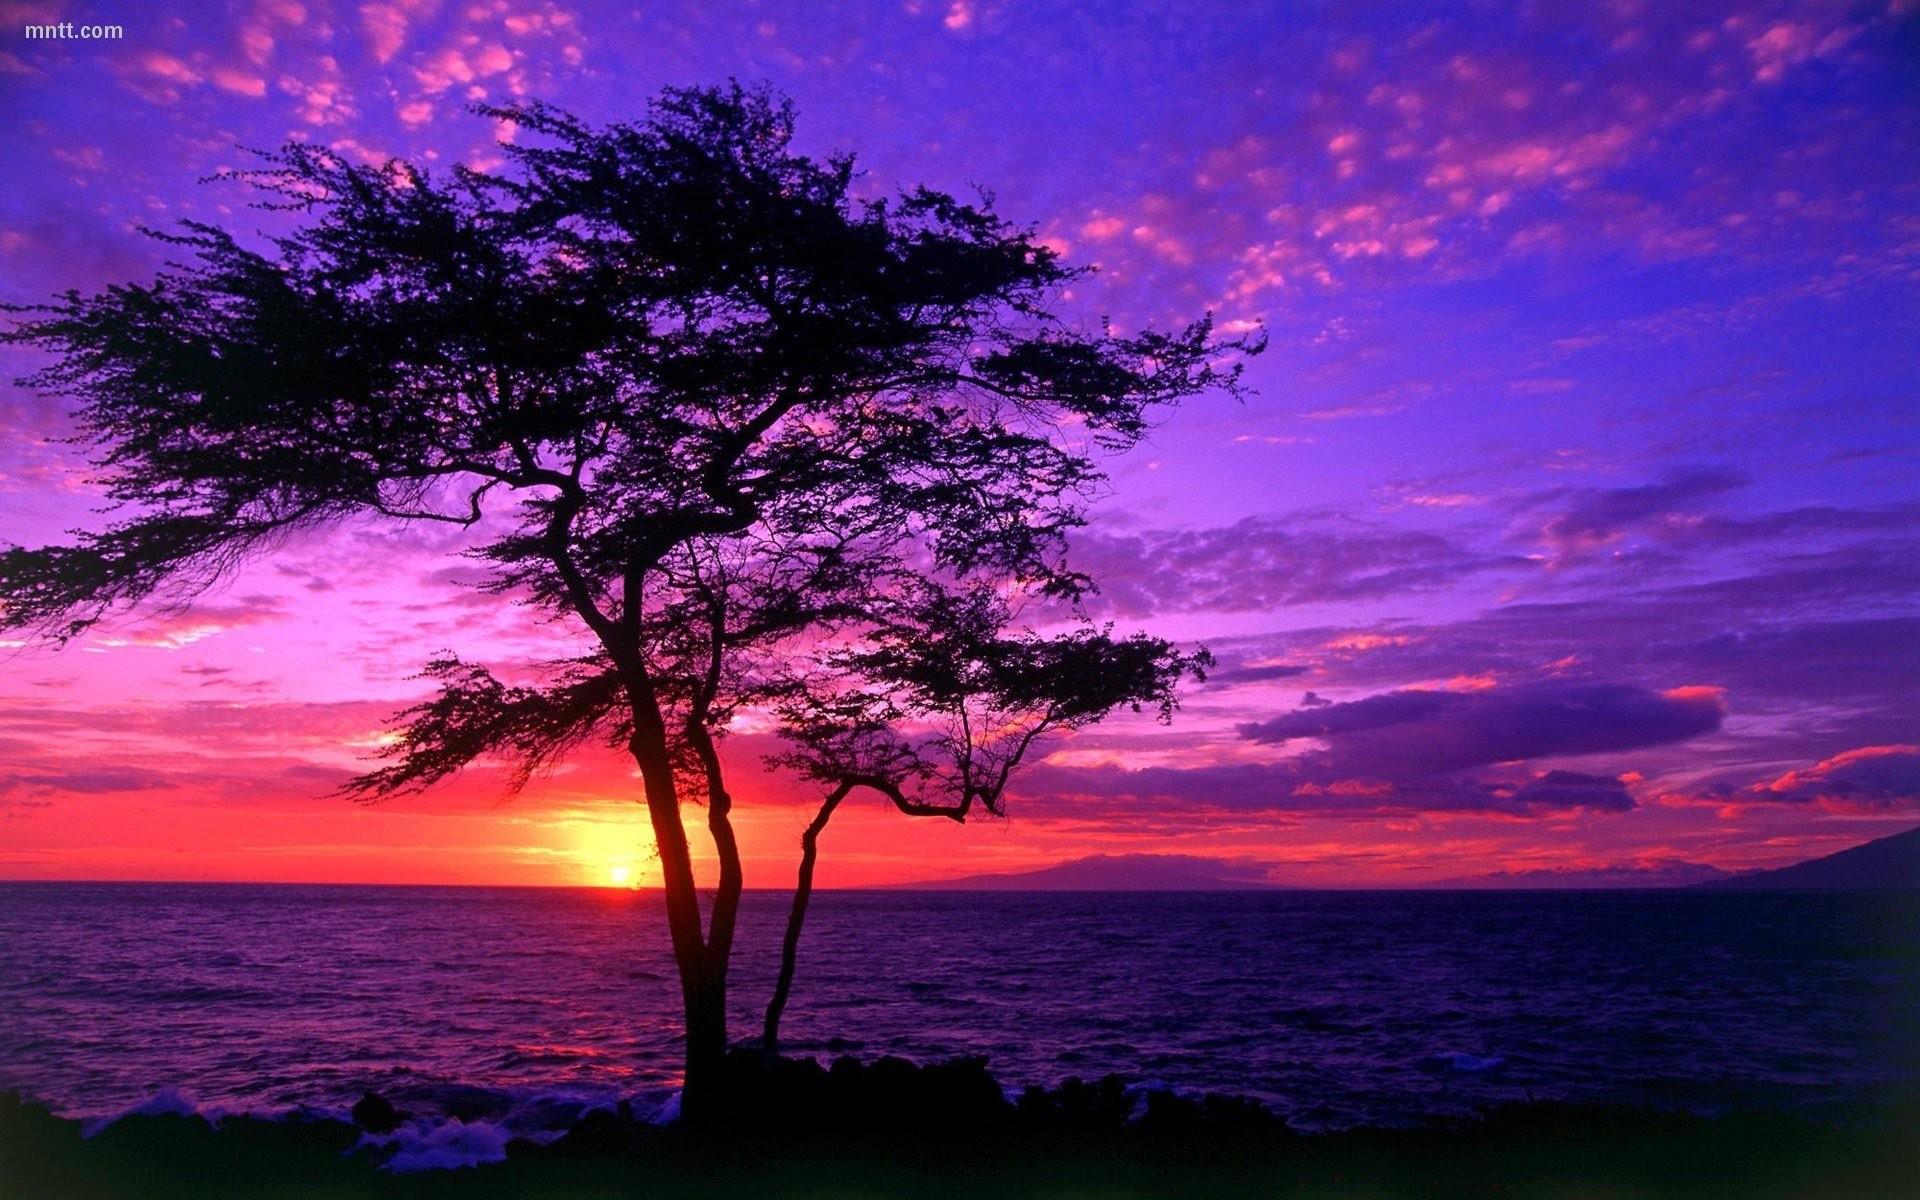 Free Beautiful Sunset Wallpapers Naldz Graphics 1920×1200 Pretty Sunset  Backgrounds (17 Wallpapers)